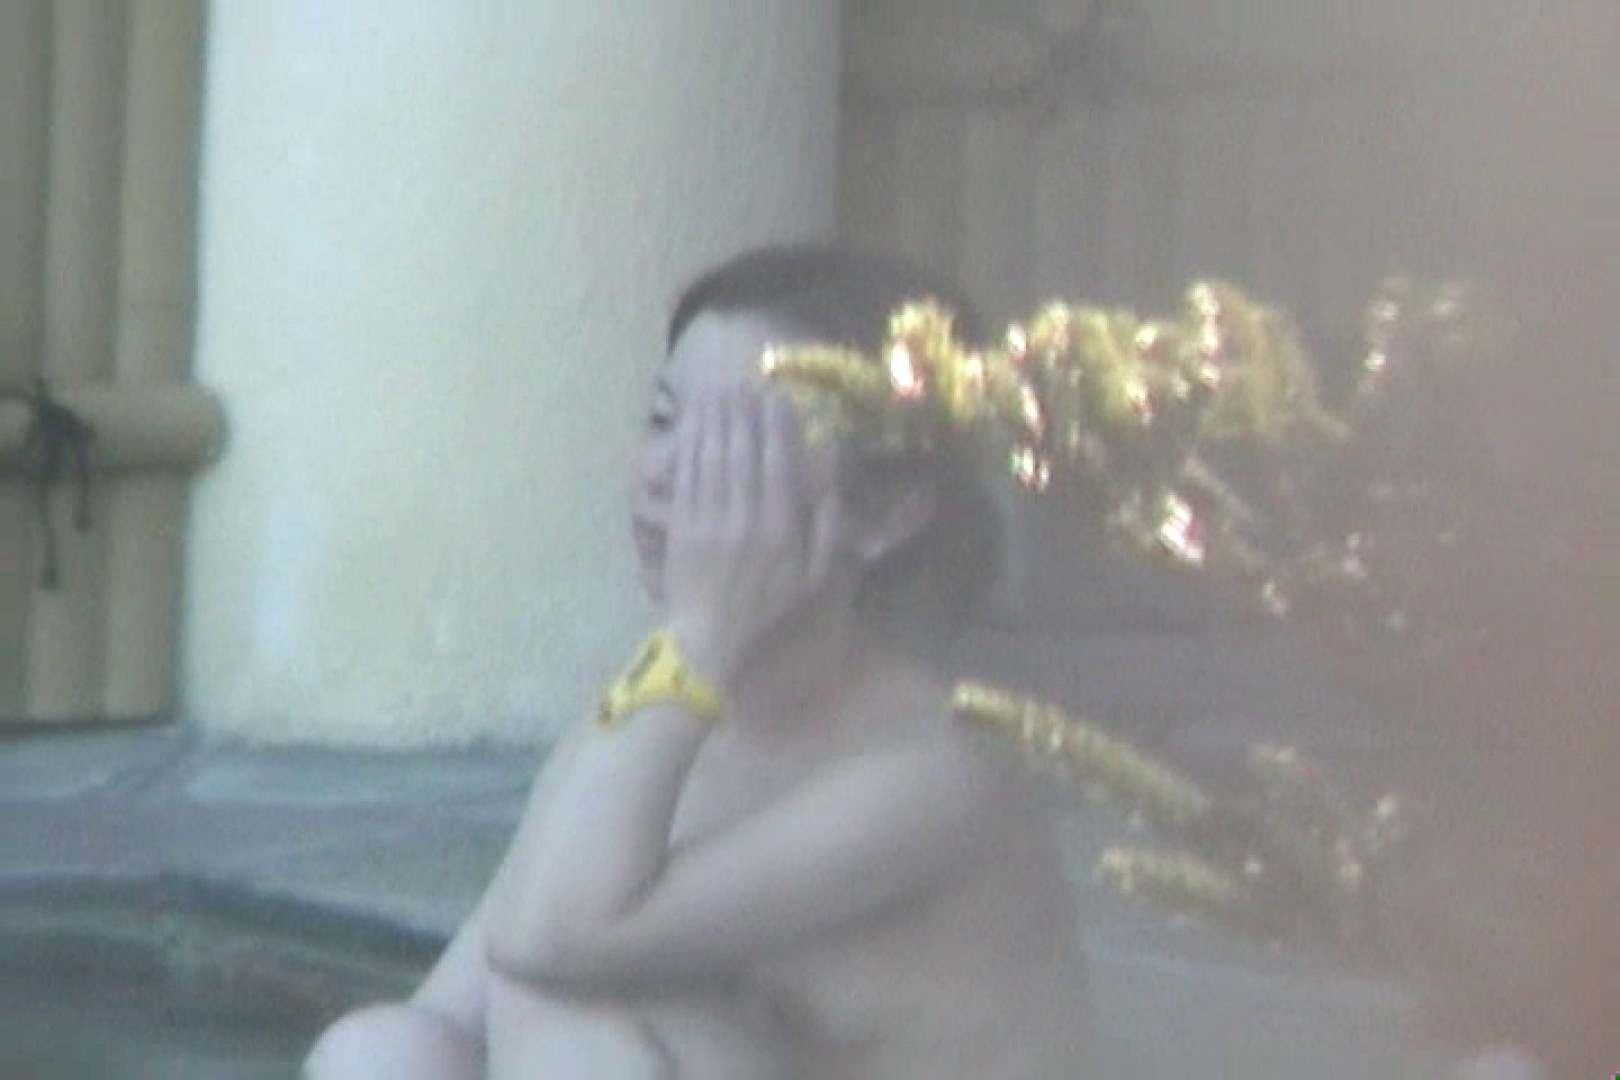 Aquaな露天風呂Vol.559 露天 SEX無修正画像 72連発 69